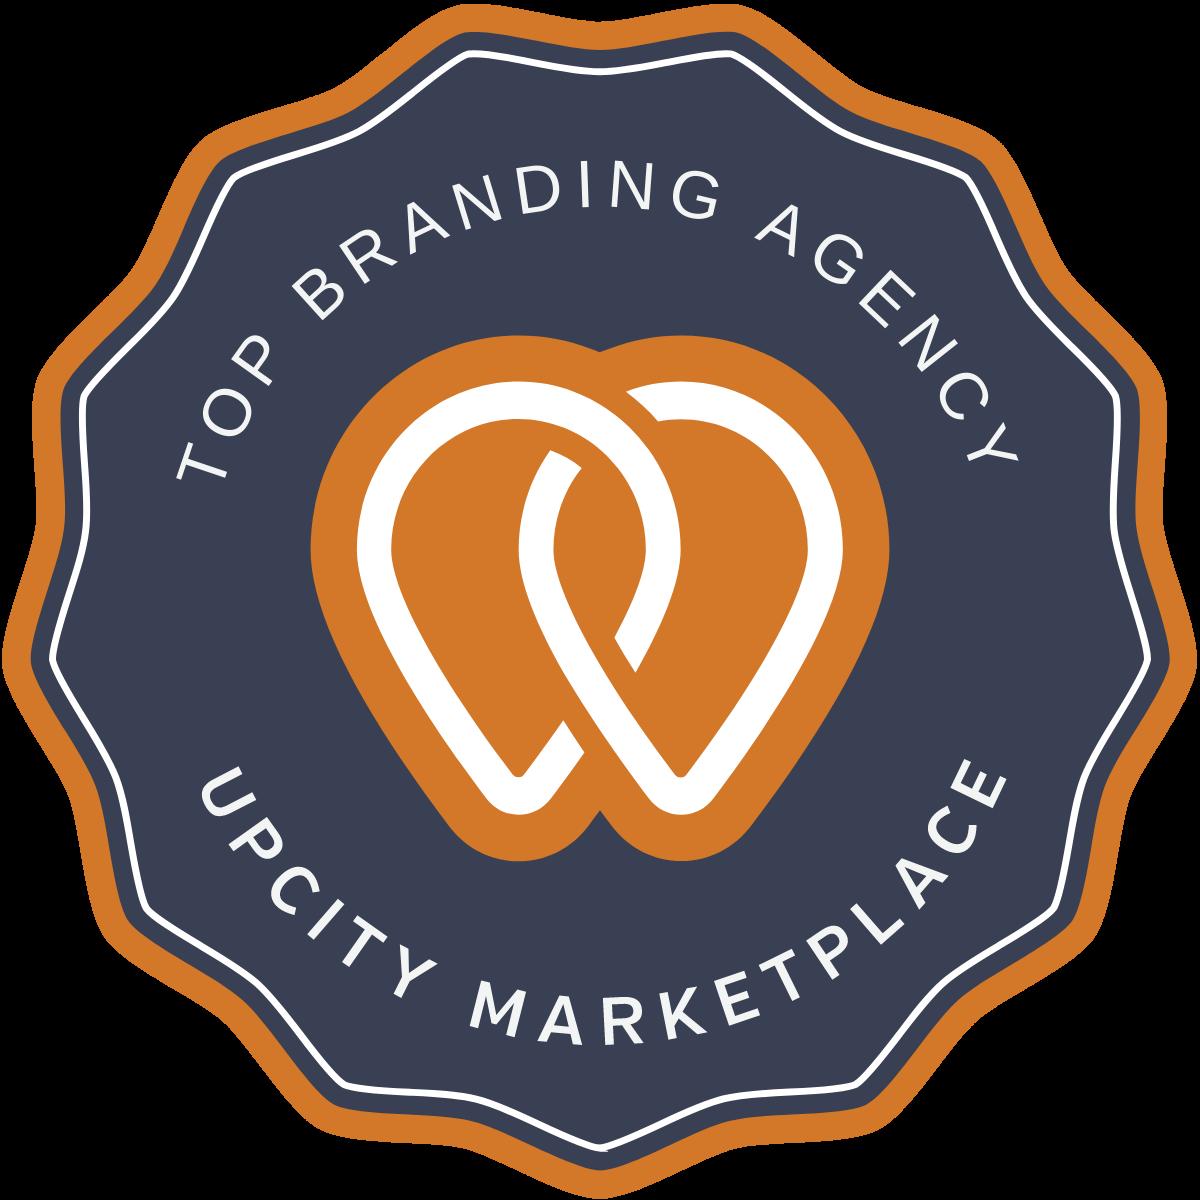 Upcity Branding Award